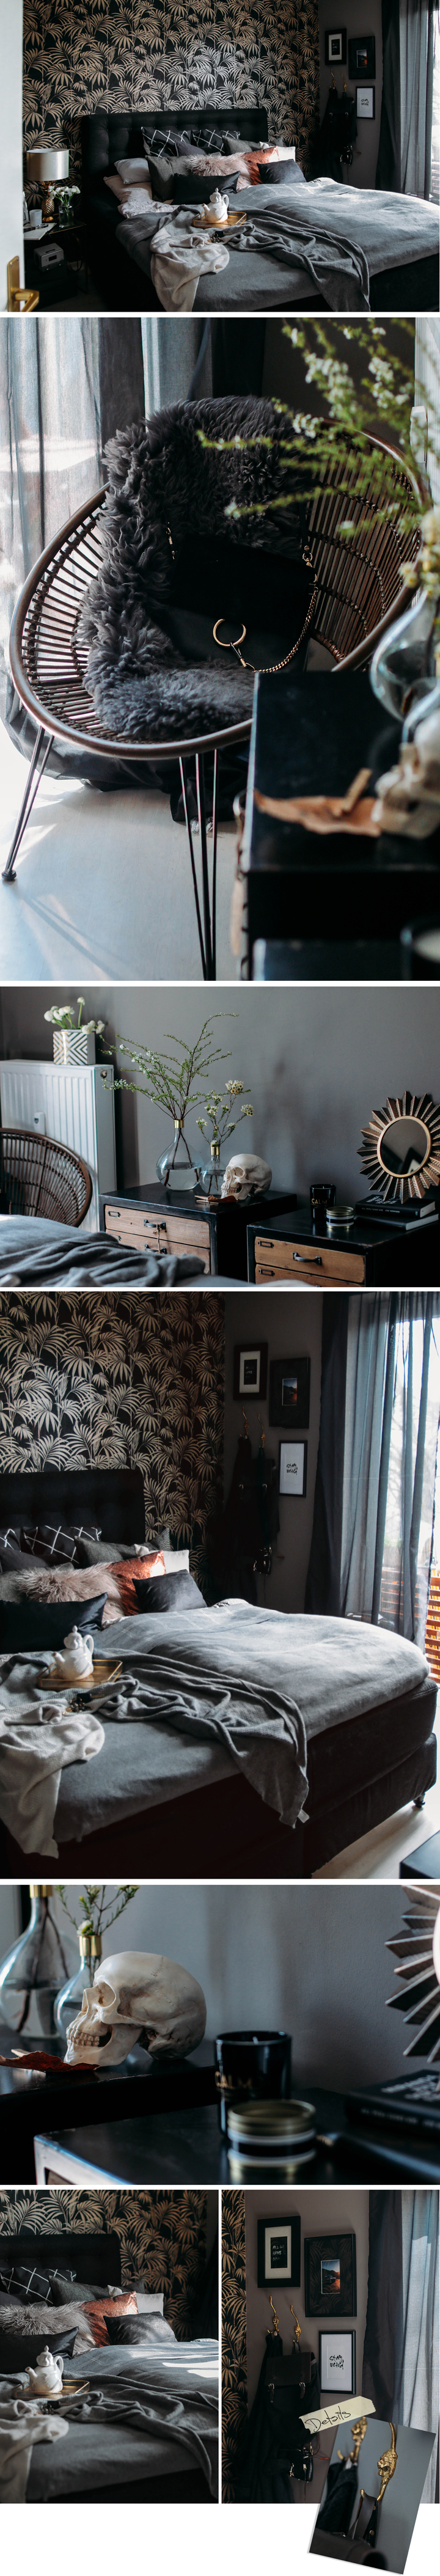 IKEA_Vallavik_Bedroom_Lina_Mallon-9160